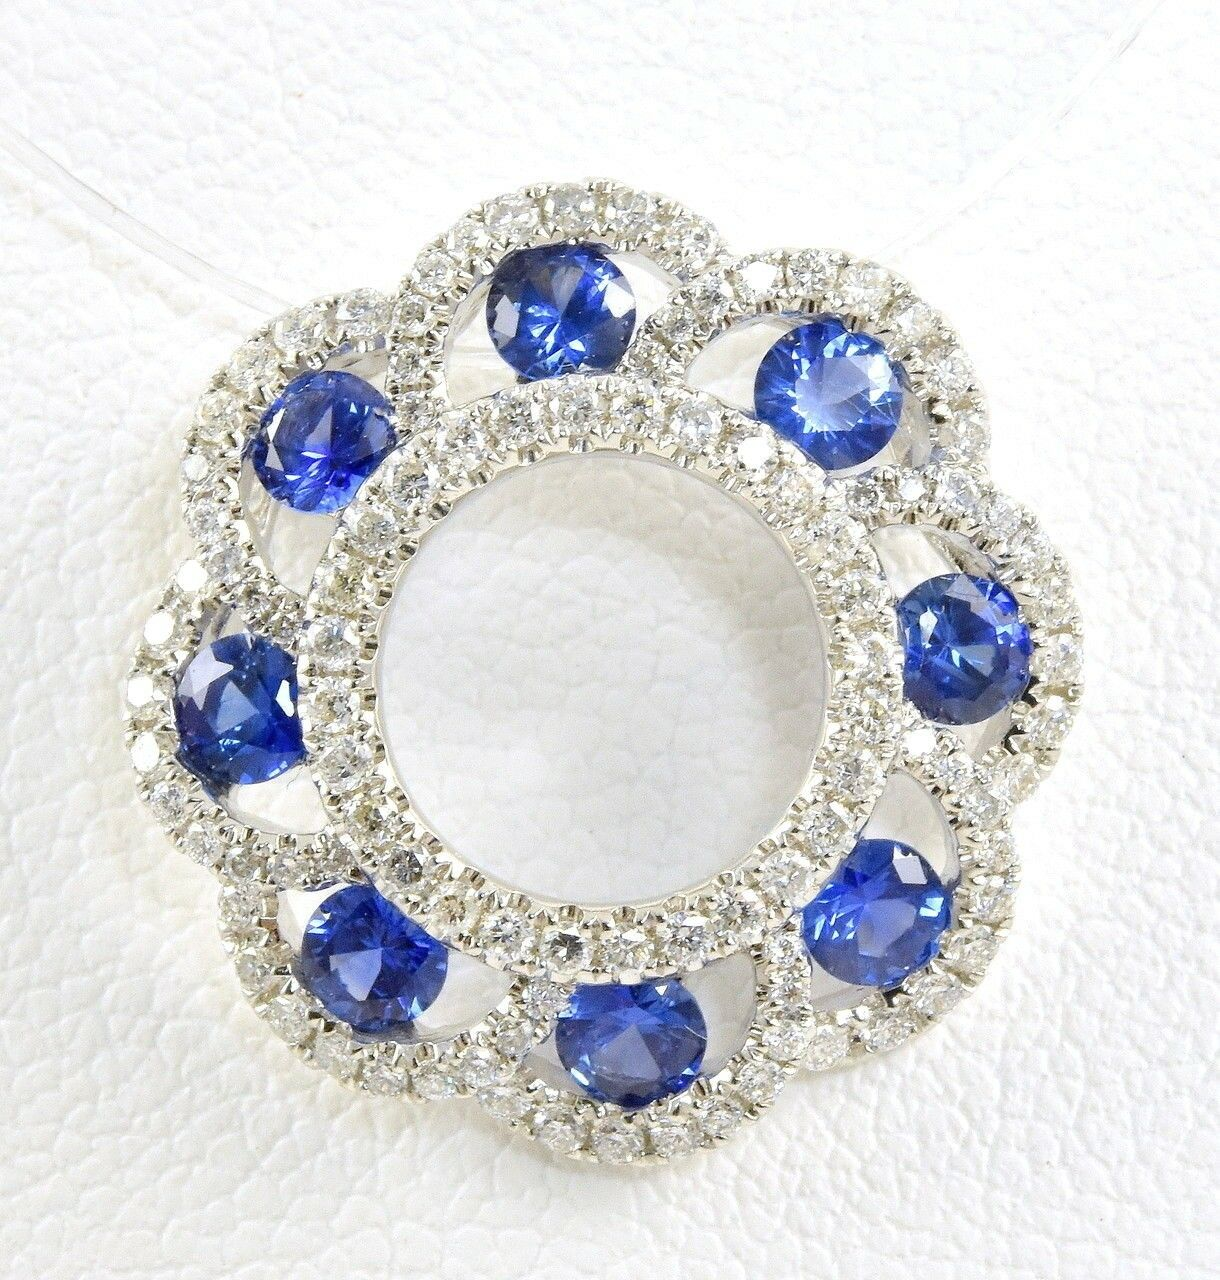 18K White gold 1.17 CT Sapphire &.60 CT Round Brilliant Diamond Wreath Pendant